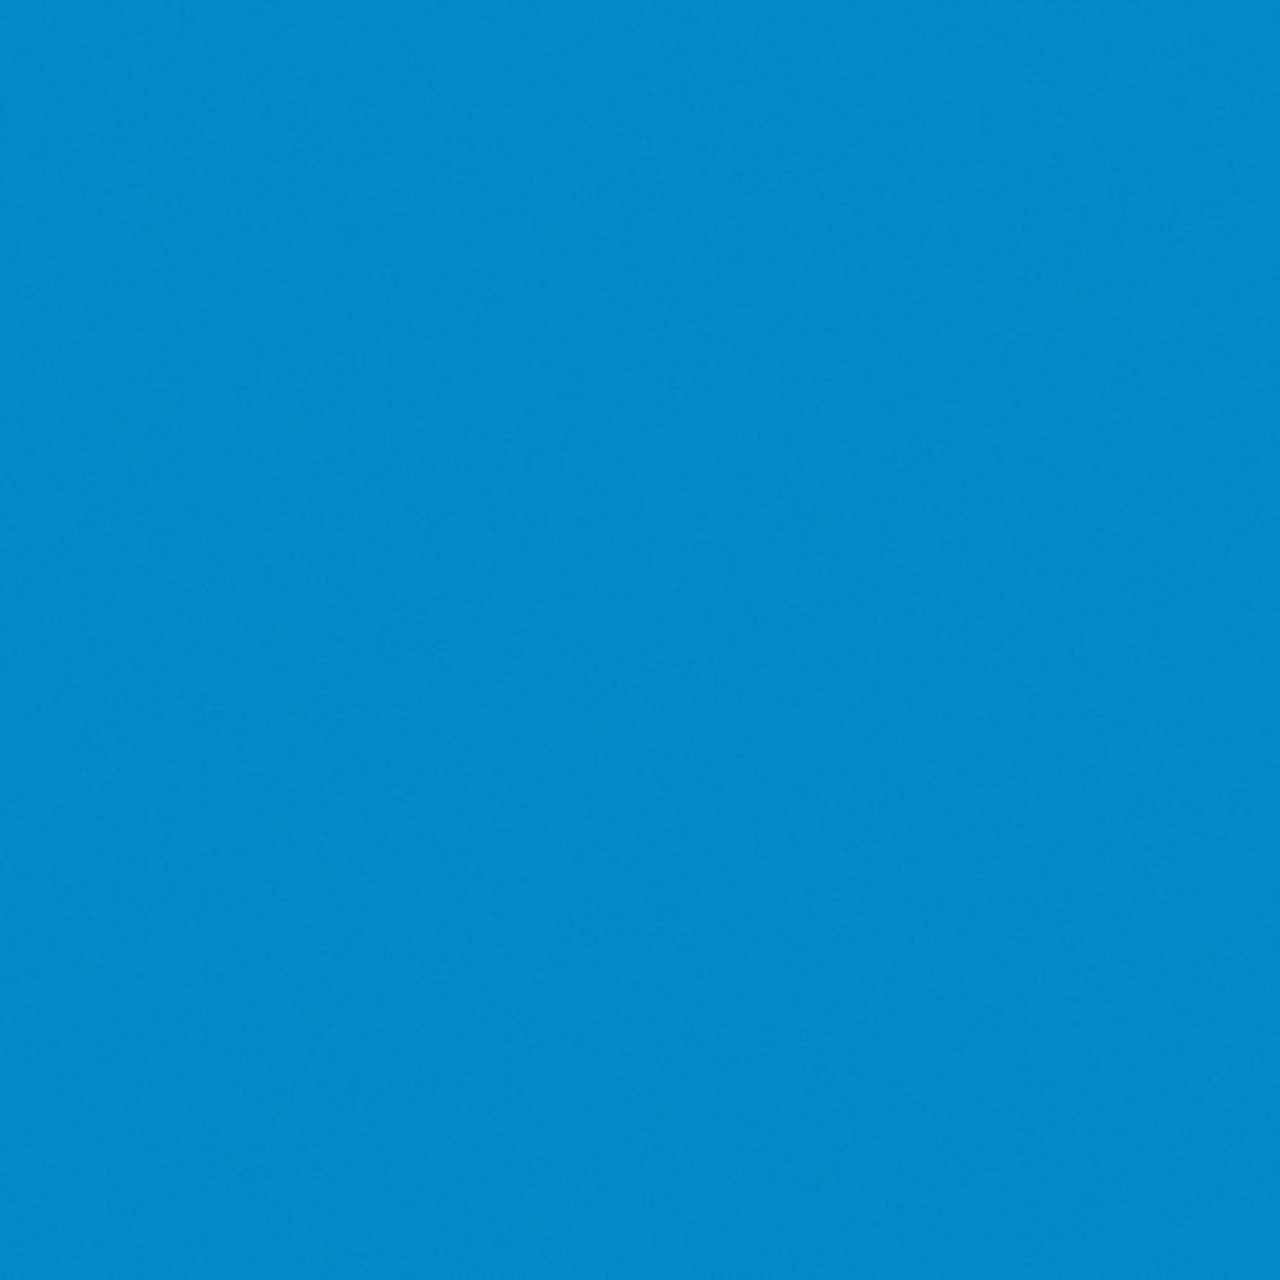 "#0064 Rosco Gels Roscolux Light Steel Blue, 20x24"""